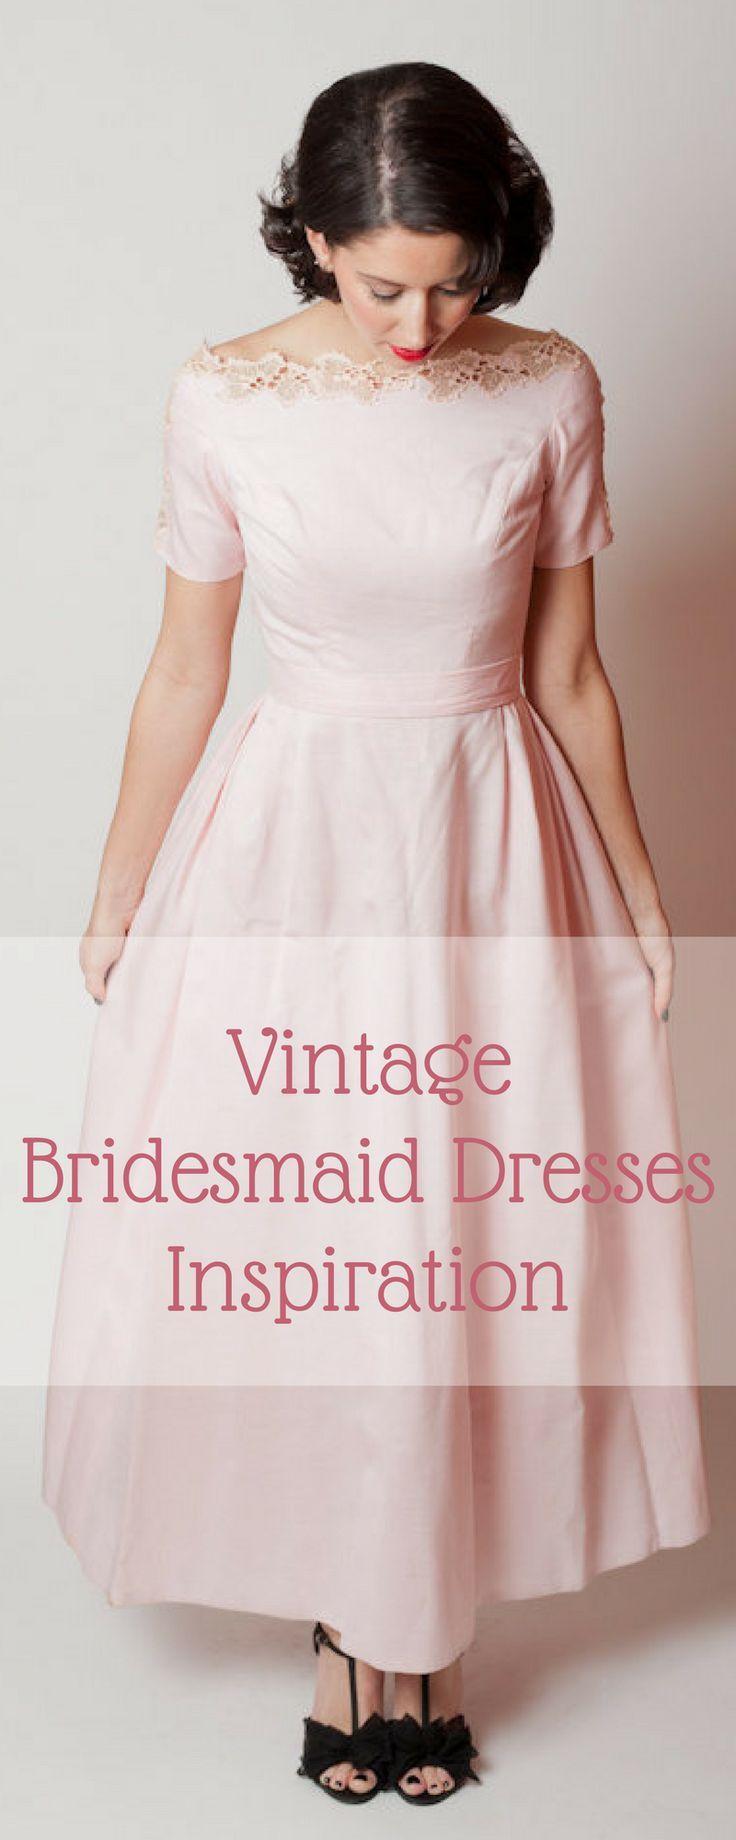 Vintage bridesmaid dresses i love vintage style style and dresses vintage bridesmaid dresses ombrellifo Image collections